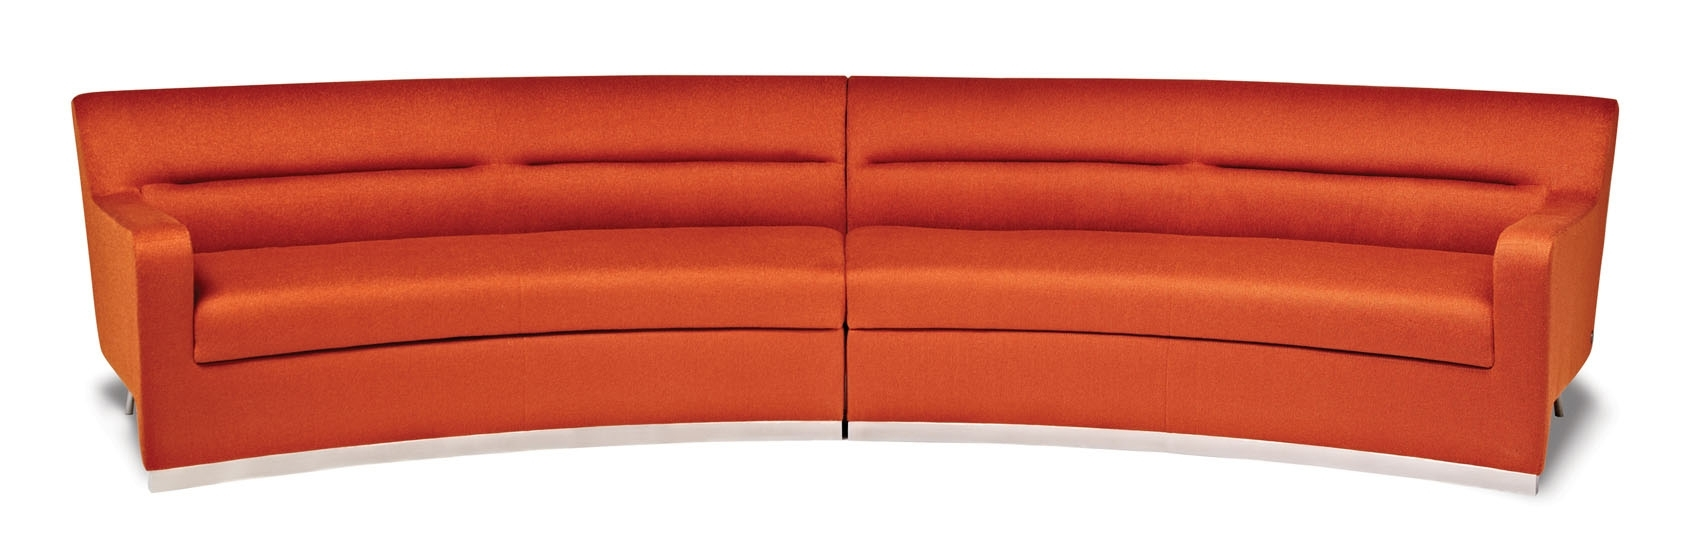 American Leather Niagara Sectional Sofa | Modern Furniture Pertaining To Niagara Sectional Sofas (Image 2 of 10)